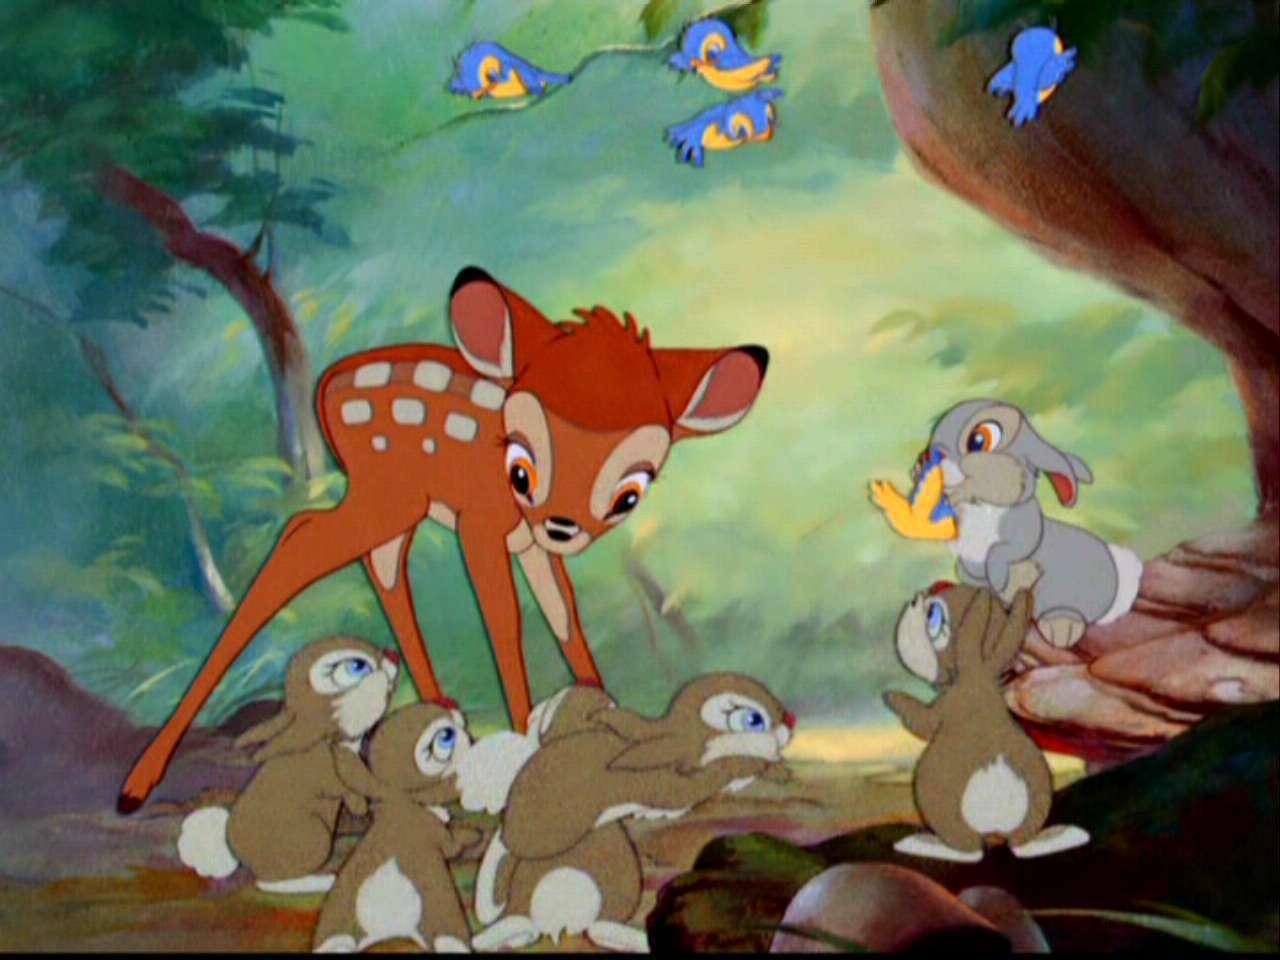 Bambi bambi 5777799 1280 960jpg 1280x960